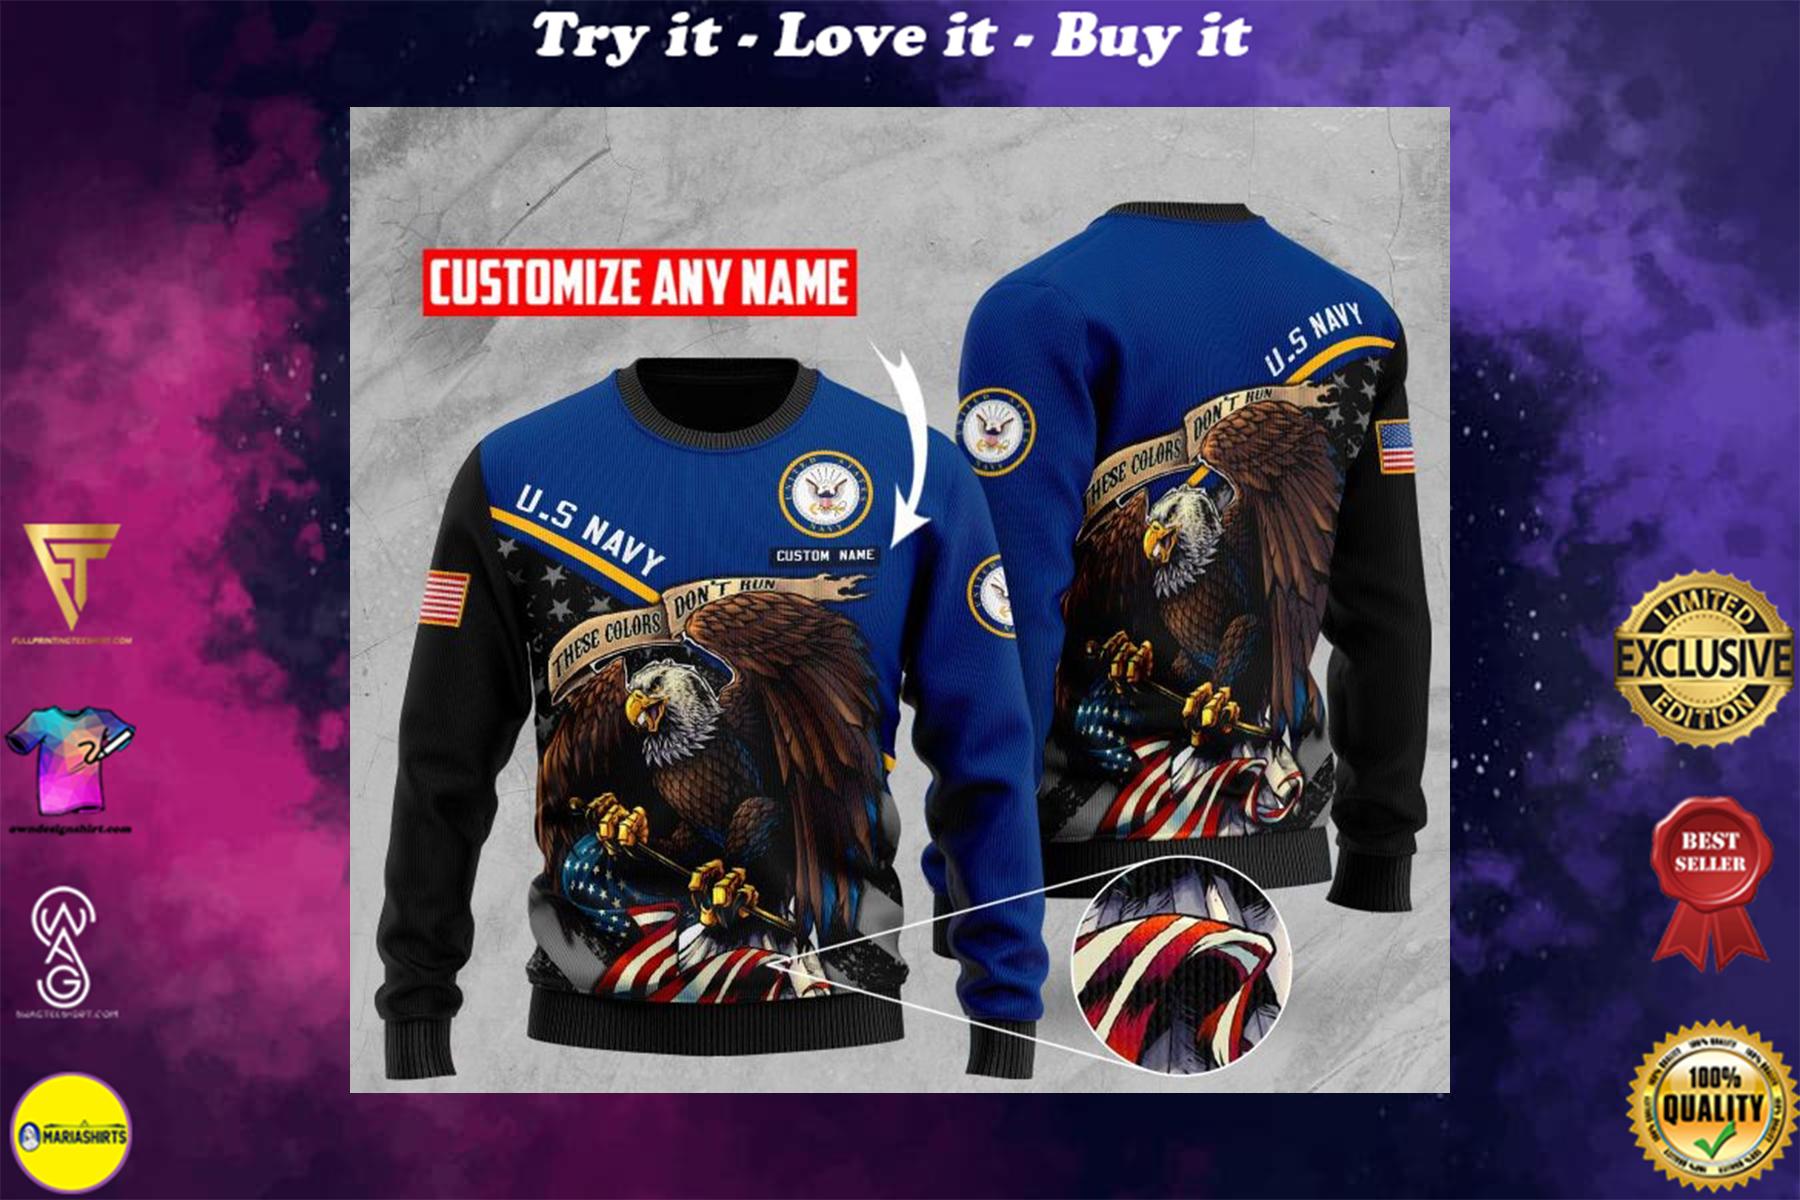 custom name us navy bald eagle american flag ugly sweater